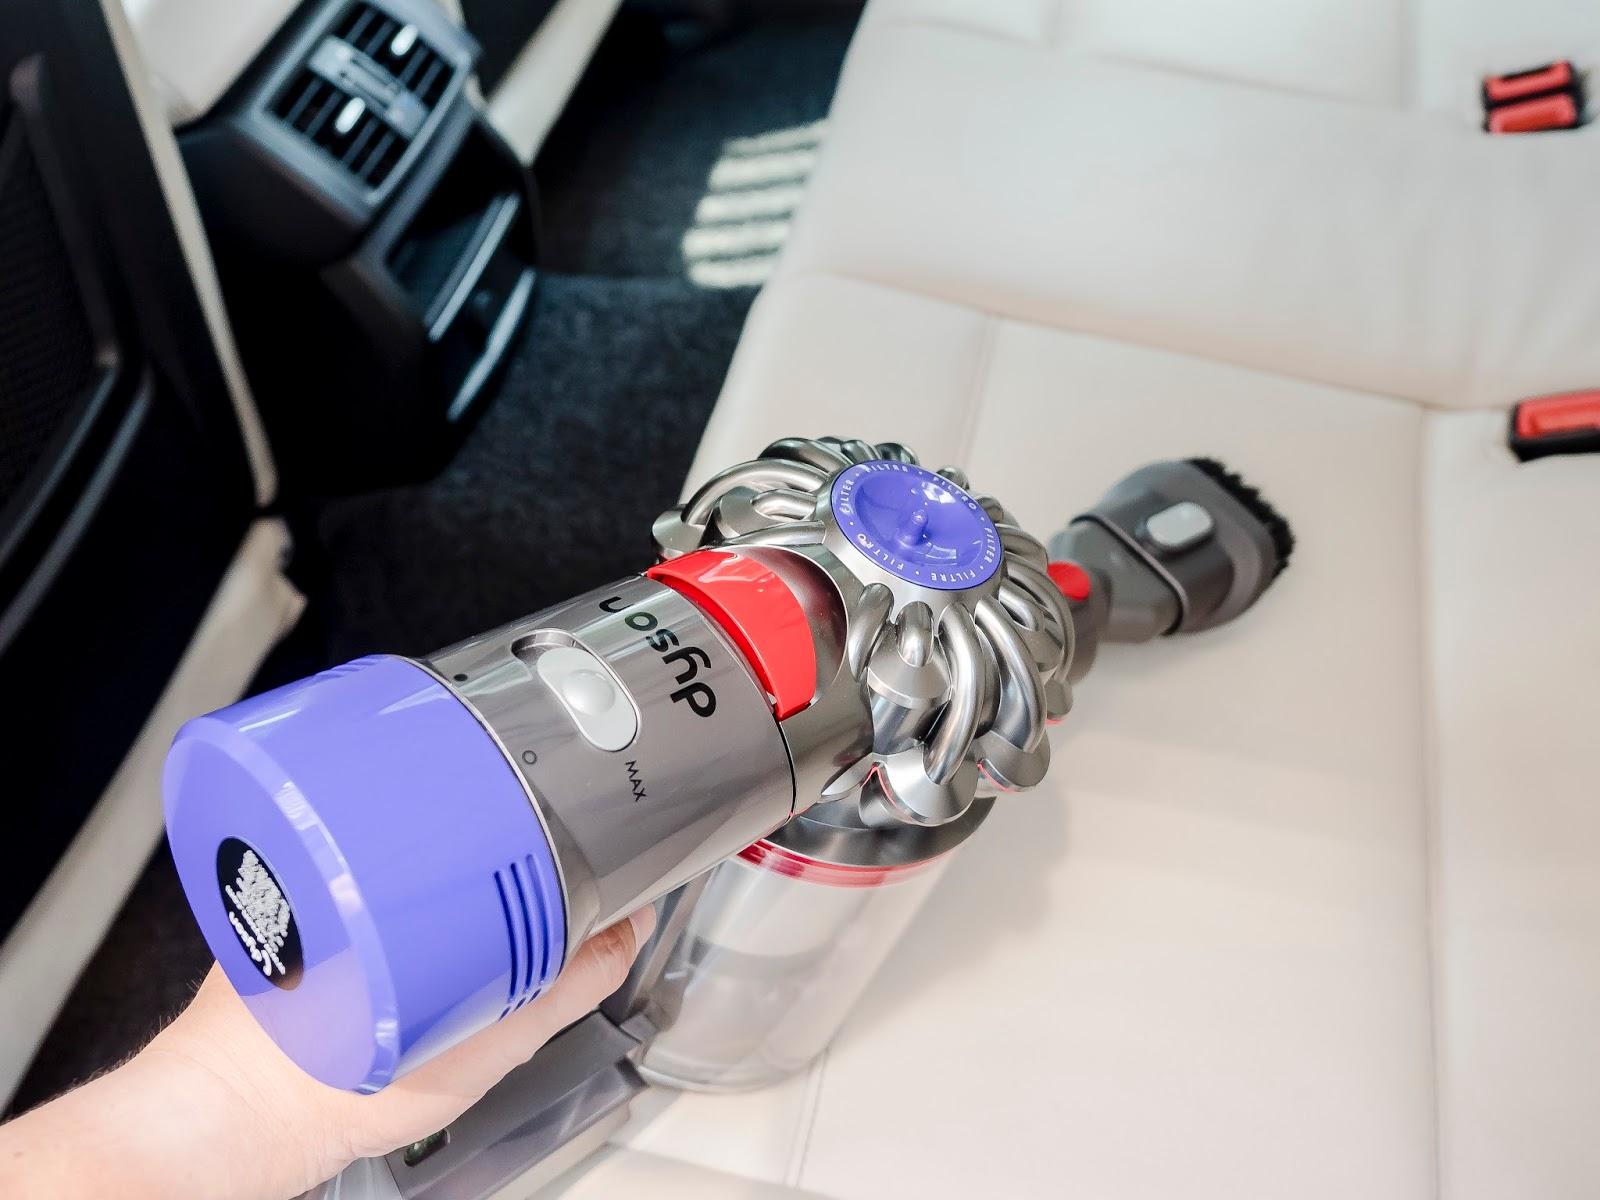 The Ulitmate Family Vacuum Cleaner Dyson V8 Fluffy The